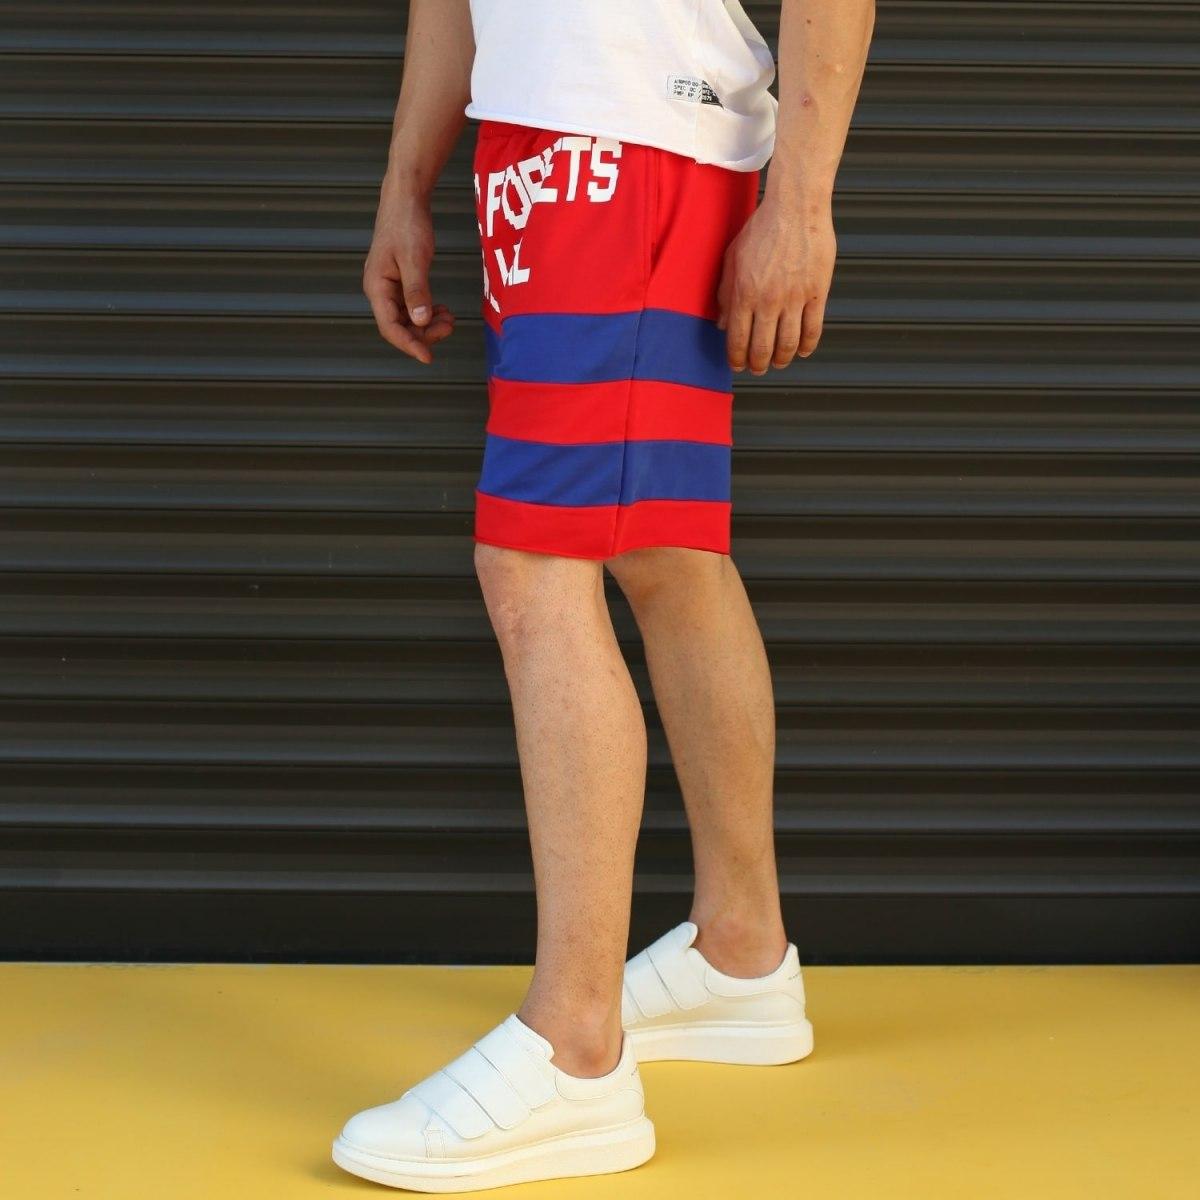 Men's Who Forgets Will Heal Fleece Sport Shorts Red Mv Premium Brand - 3